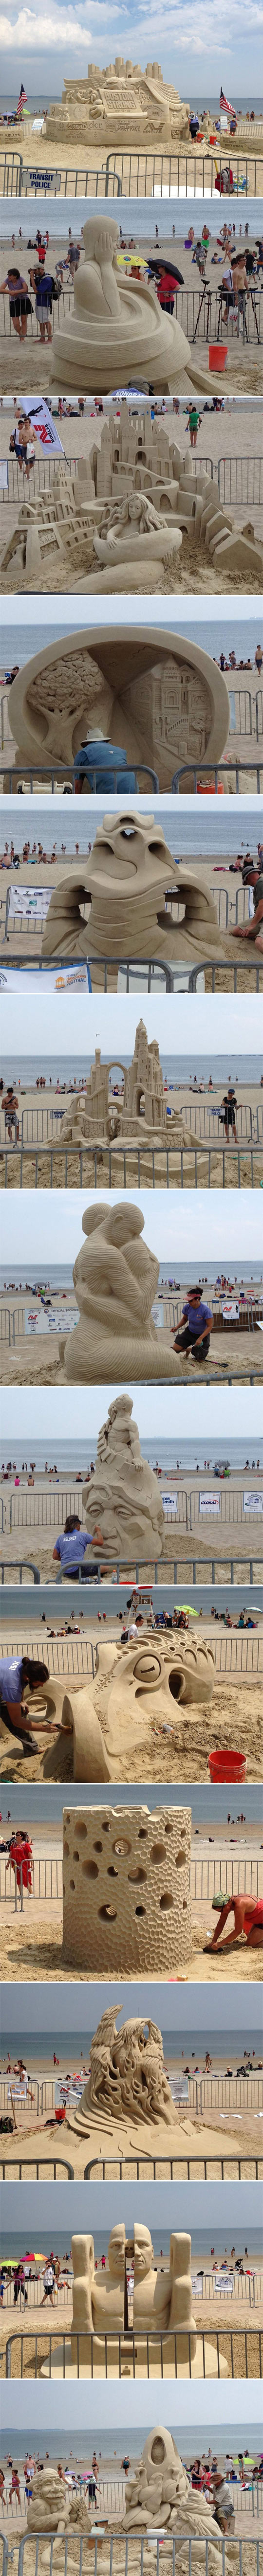 cool-beach-sand-sculptures-Revere